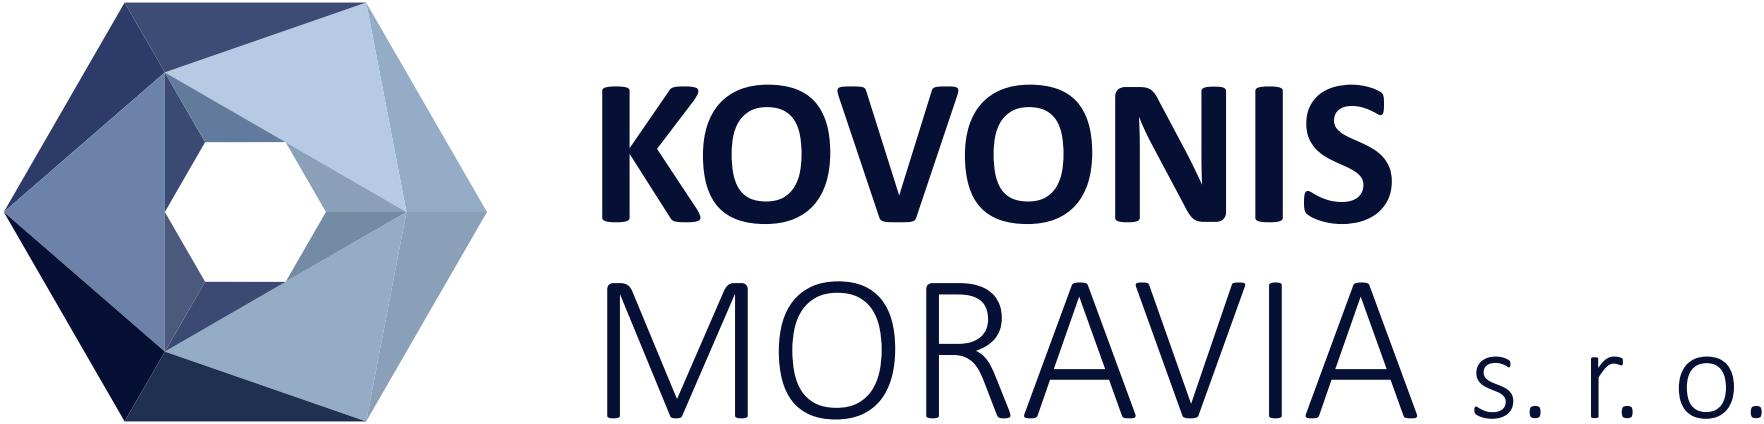 Kovonis.cz